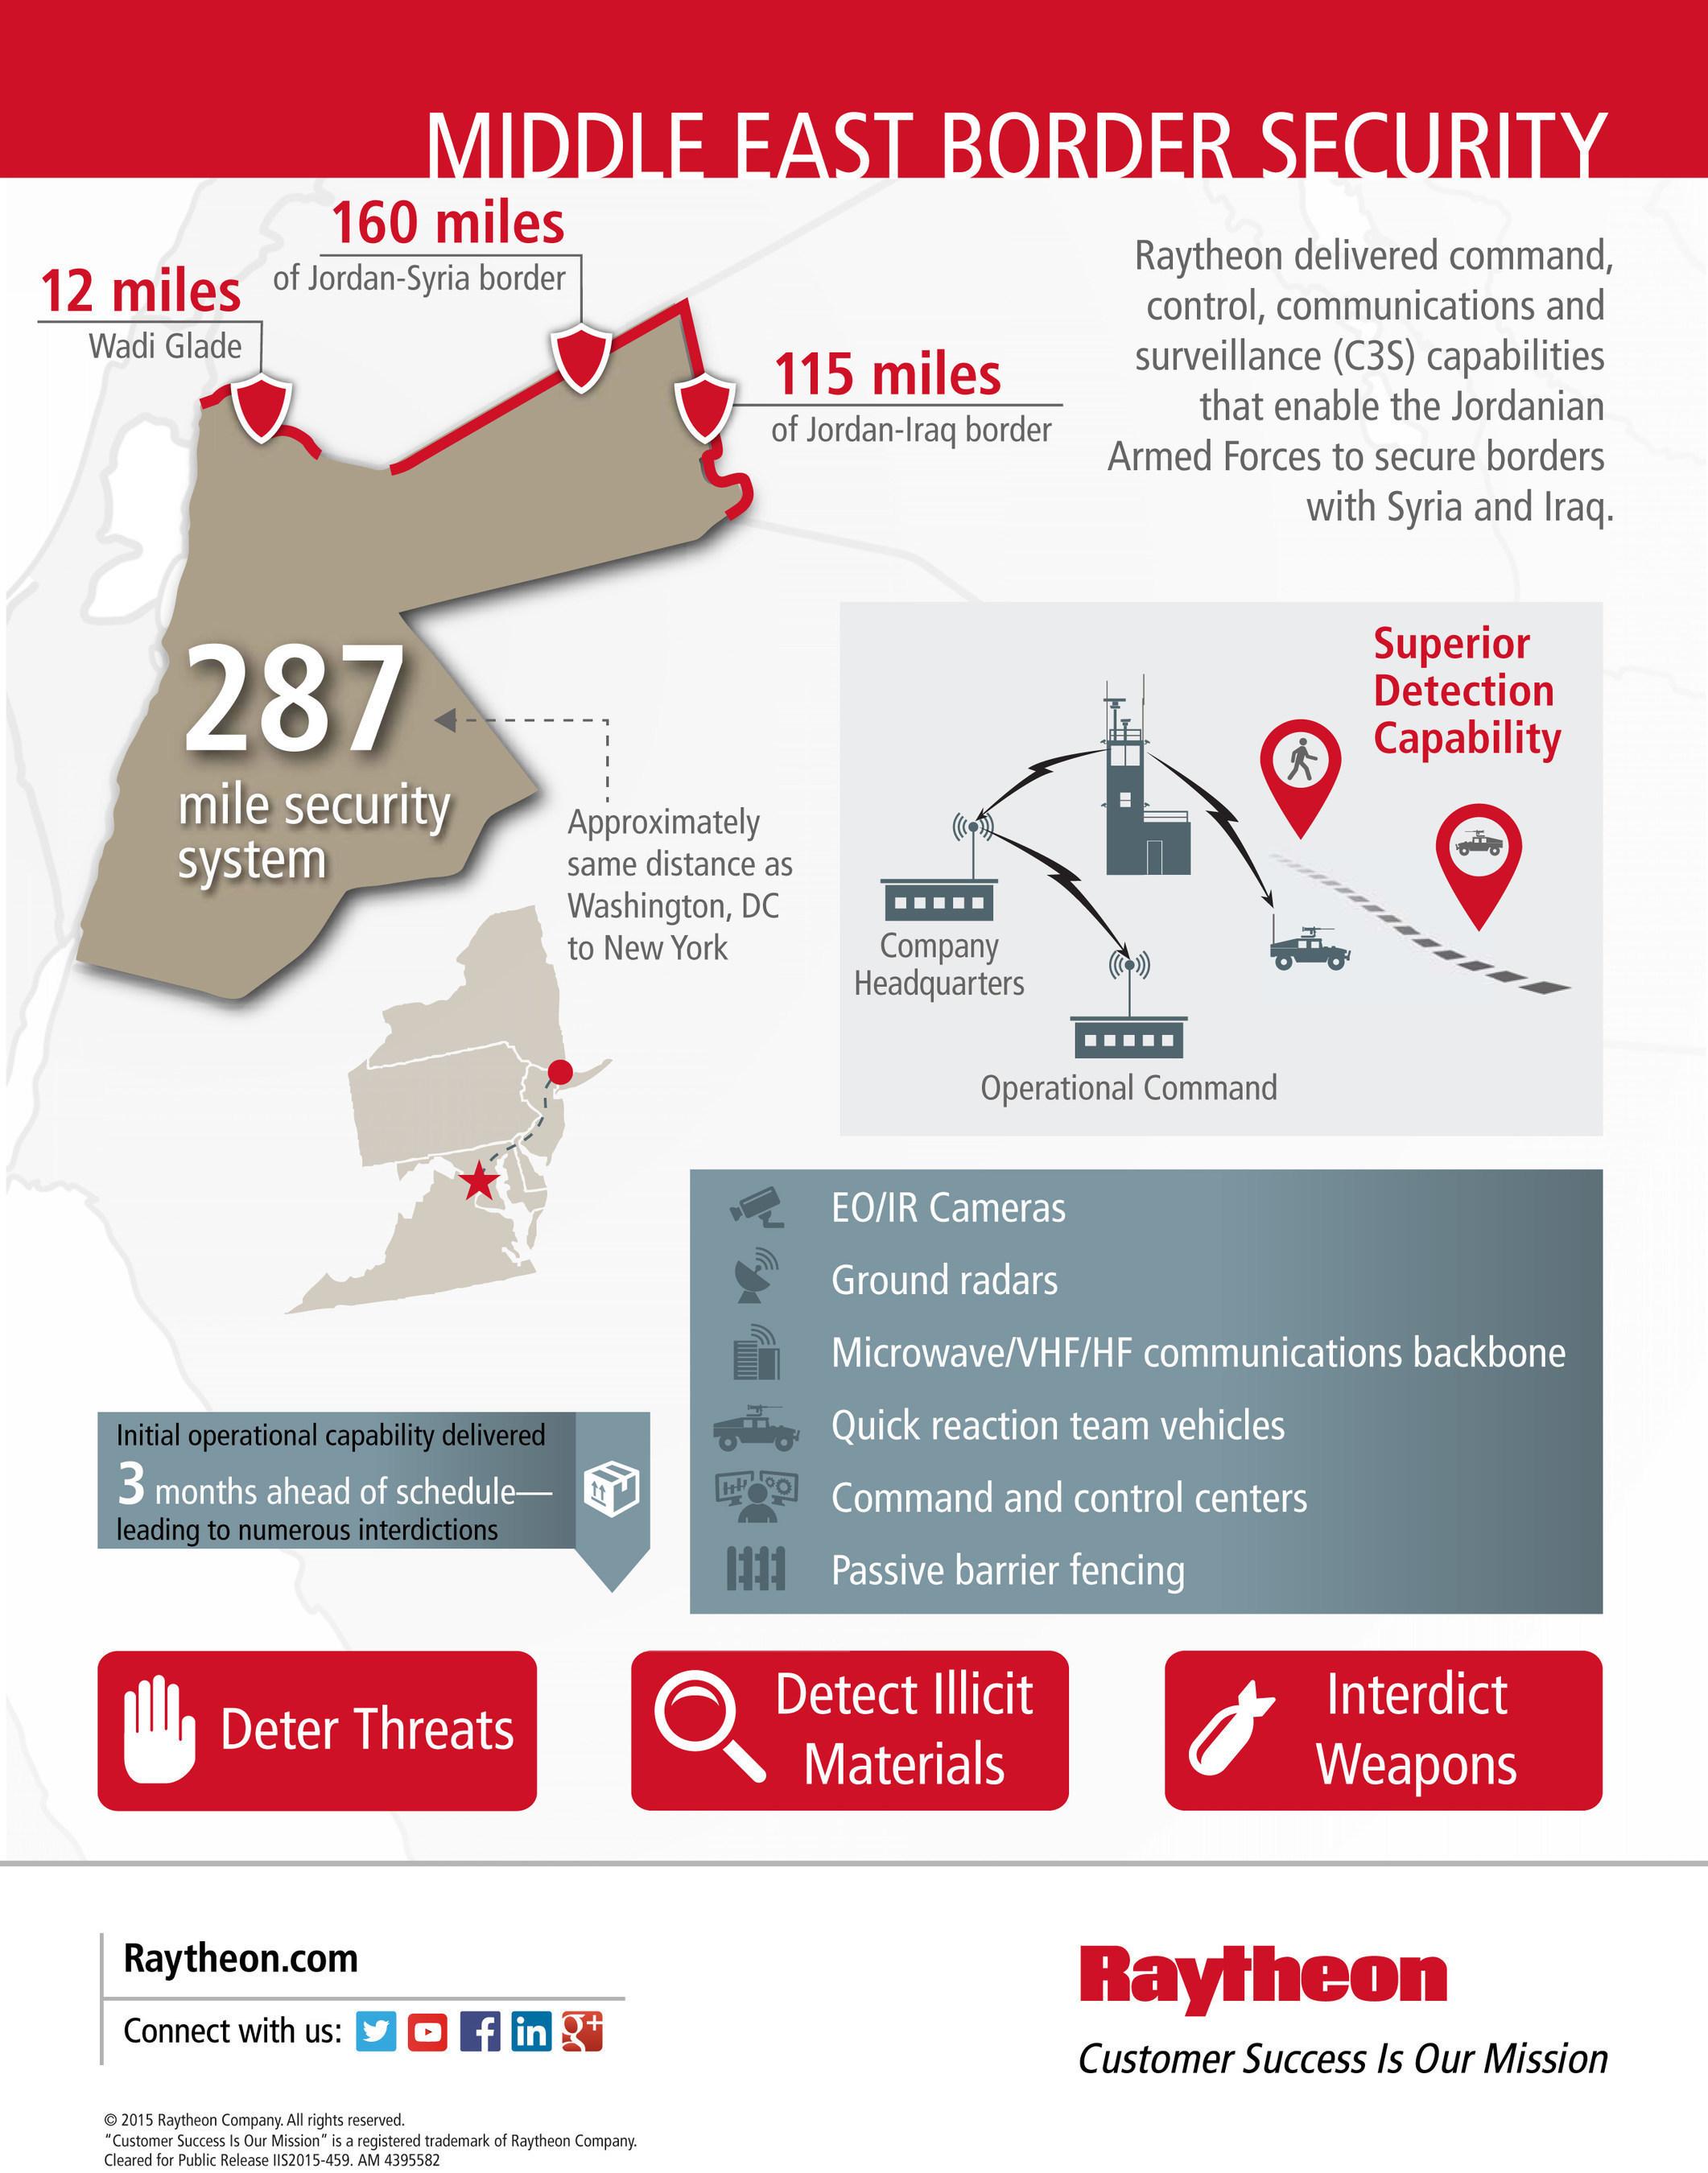 Raytheon expands border security work in Kingdom of Jordan